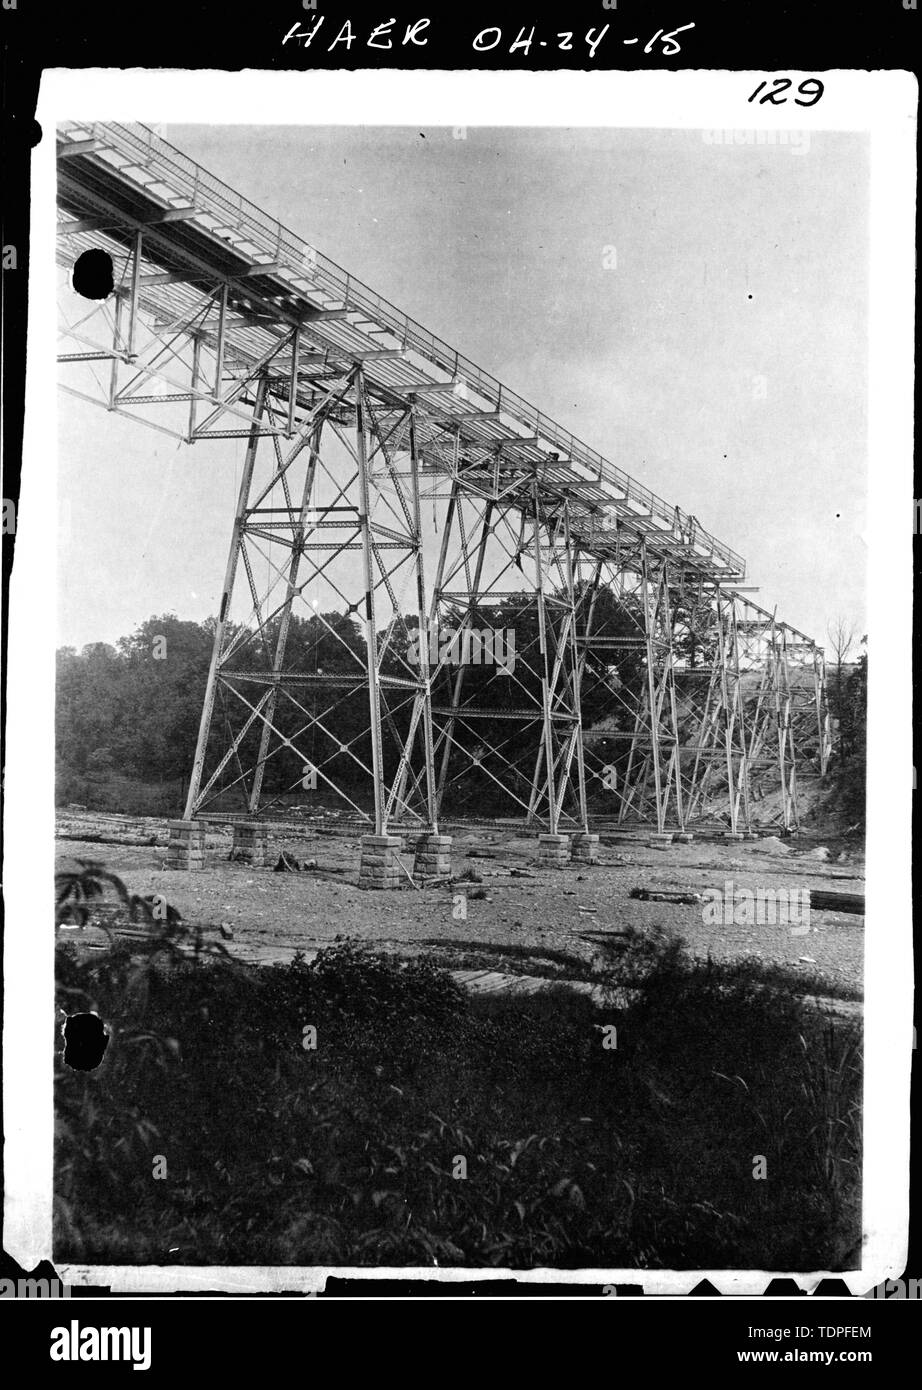 (from collection of Mrs. L.J. Fargo, Lexington, Ohio) showing CONSTRUCTION ACTIVITY OF STEELWORK FOR HIGH-LEVEL BRIDGE, 1896. - Forty-sixth Street Bridge, Spanning Ashtabula River, Ashtabula, Ashtabula County, OH - Stock Image